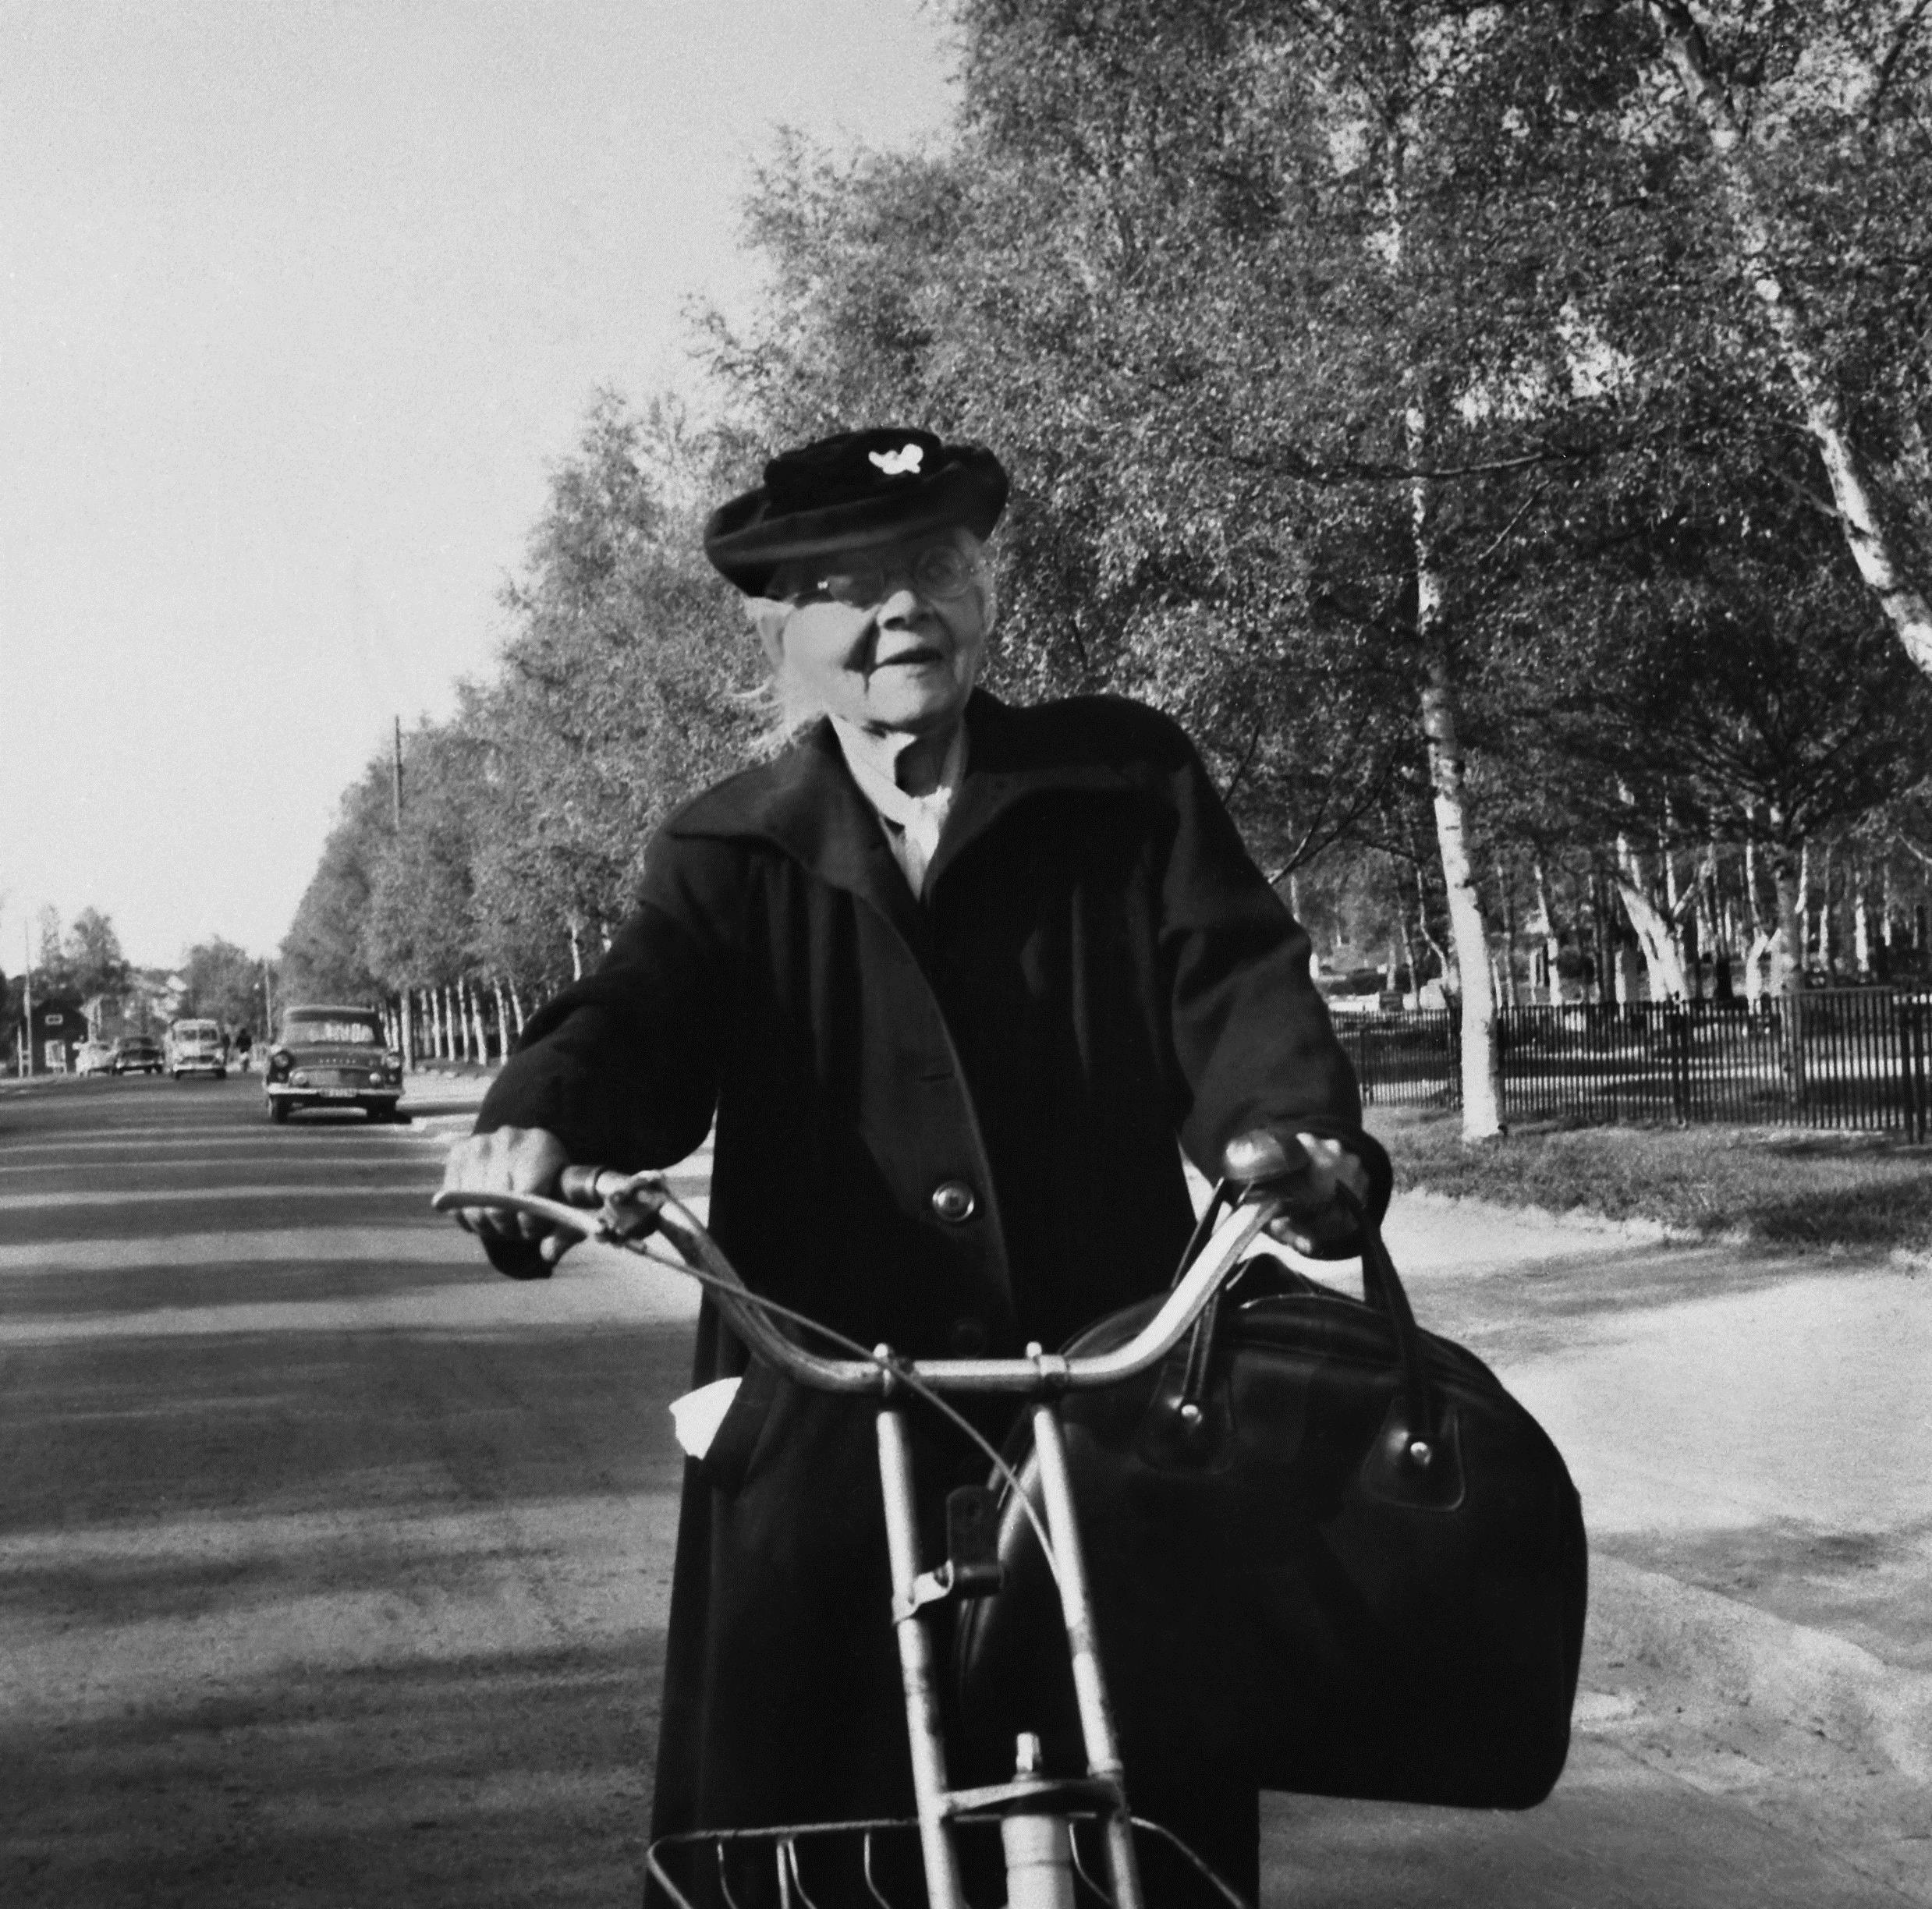 Siri Holm, 1950. Photo: Erik Persson (Luleå kommuns stadsarkiv)